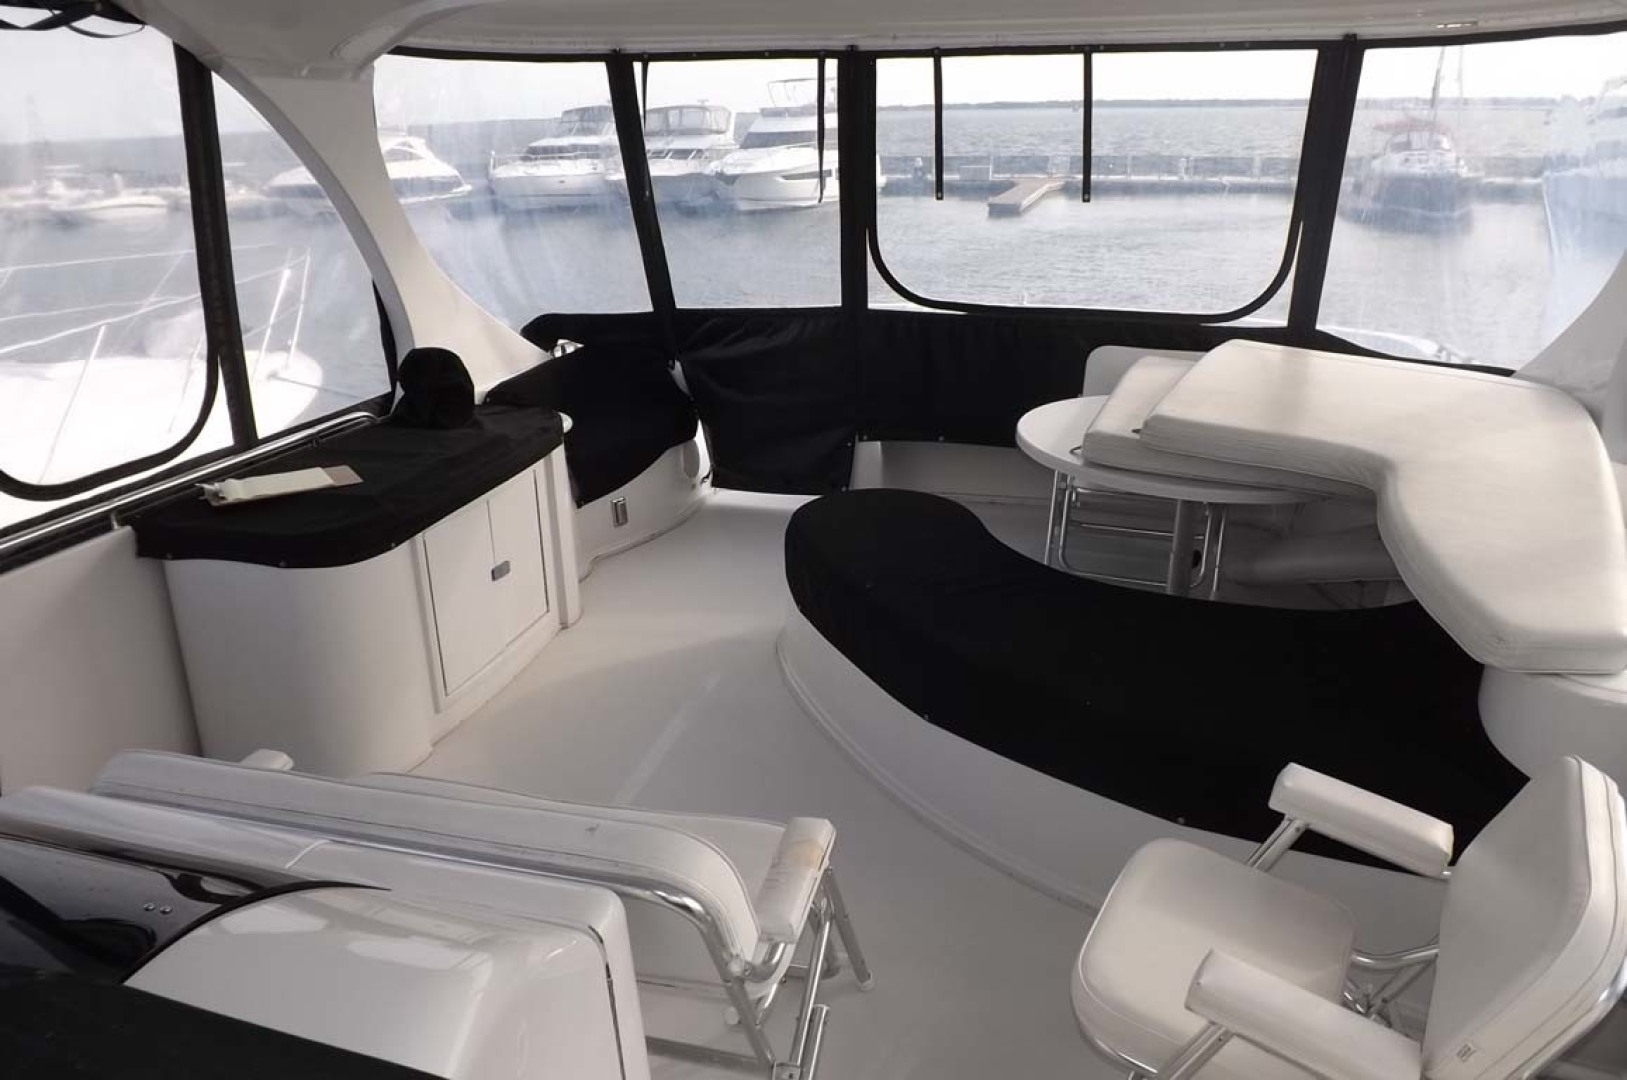 Bluewater Yachts-5200 2006 -Mount Pleasant-South Carolina-United States-Sundeck Seating-1412966 | Thumbnail